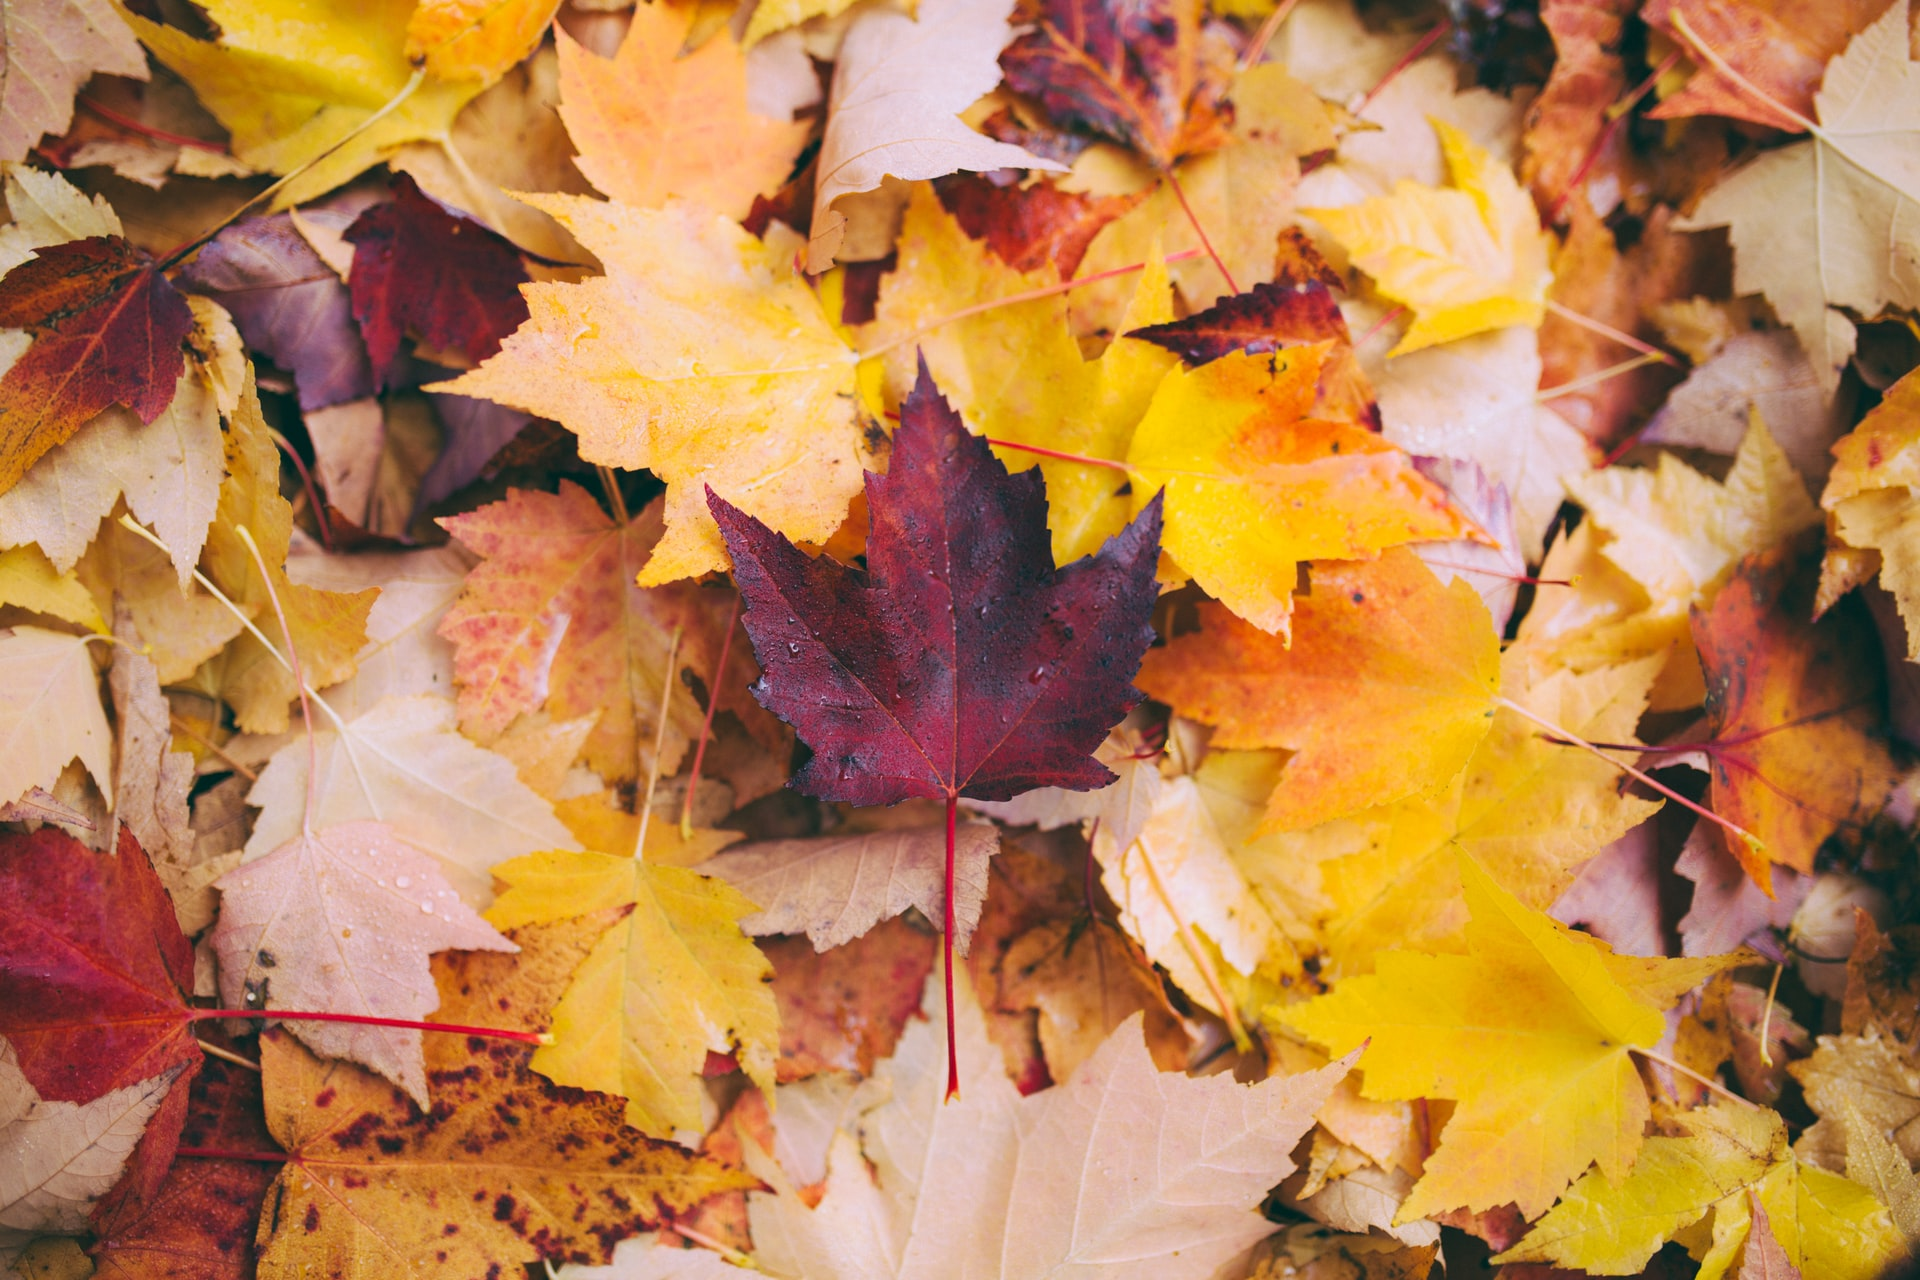 DePaul's Urban Farm: An Autumn Tradition Continues Near Central